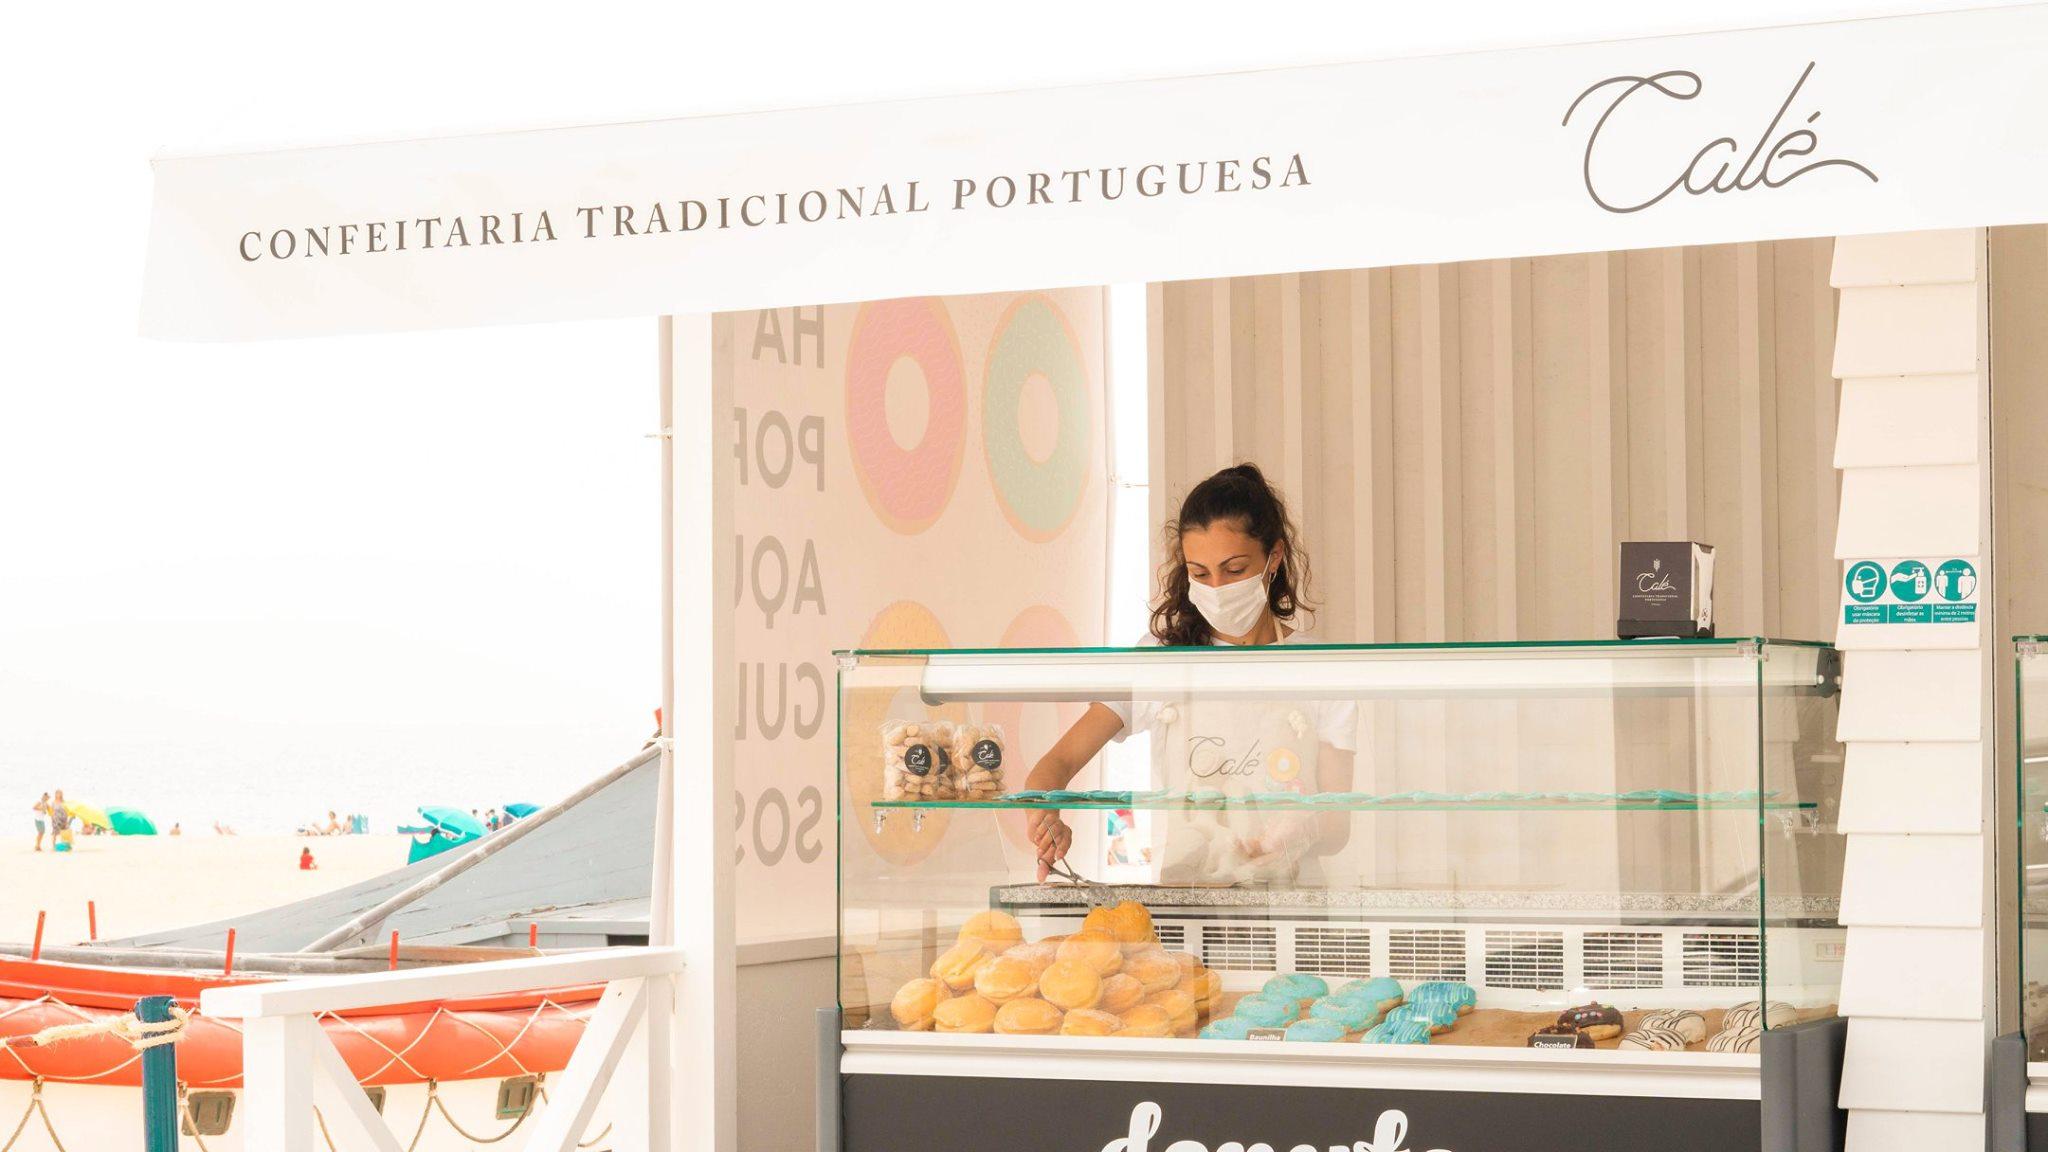 donuts-coloridos-quiosque-praia-nazare-pastelaria-entrega-casa-cale-confeitaria-tradicional-portuguesa-peniche-caldas-rainha-padaria-pastelaria